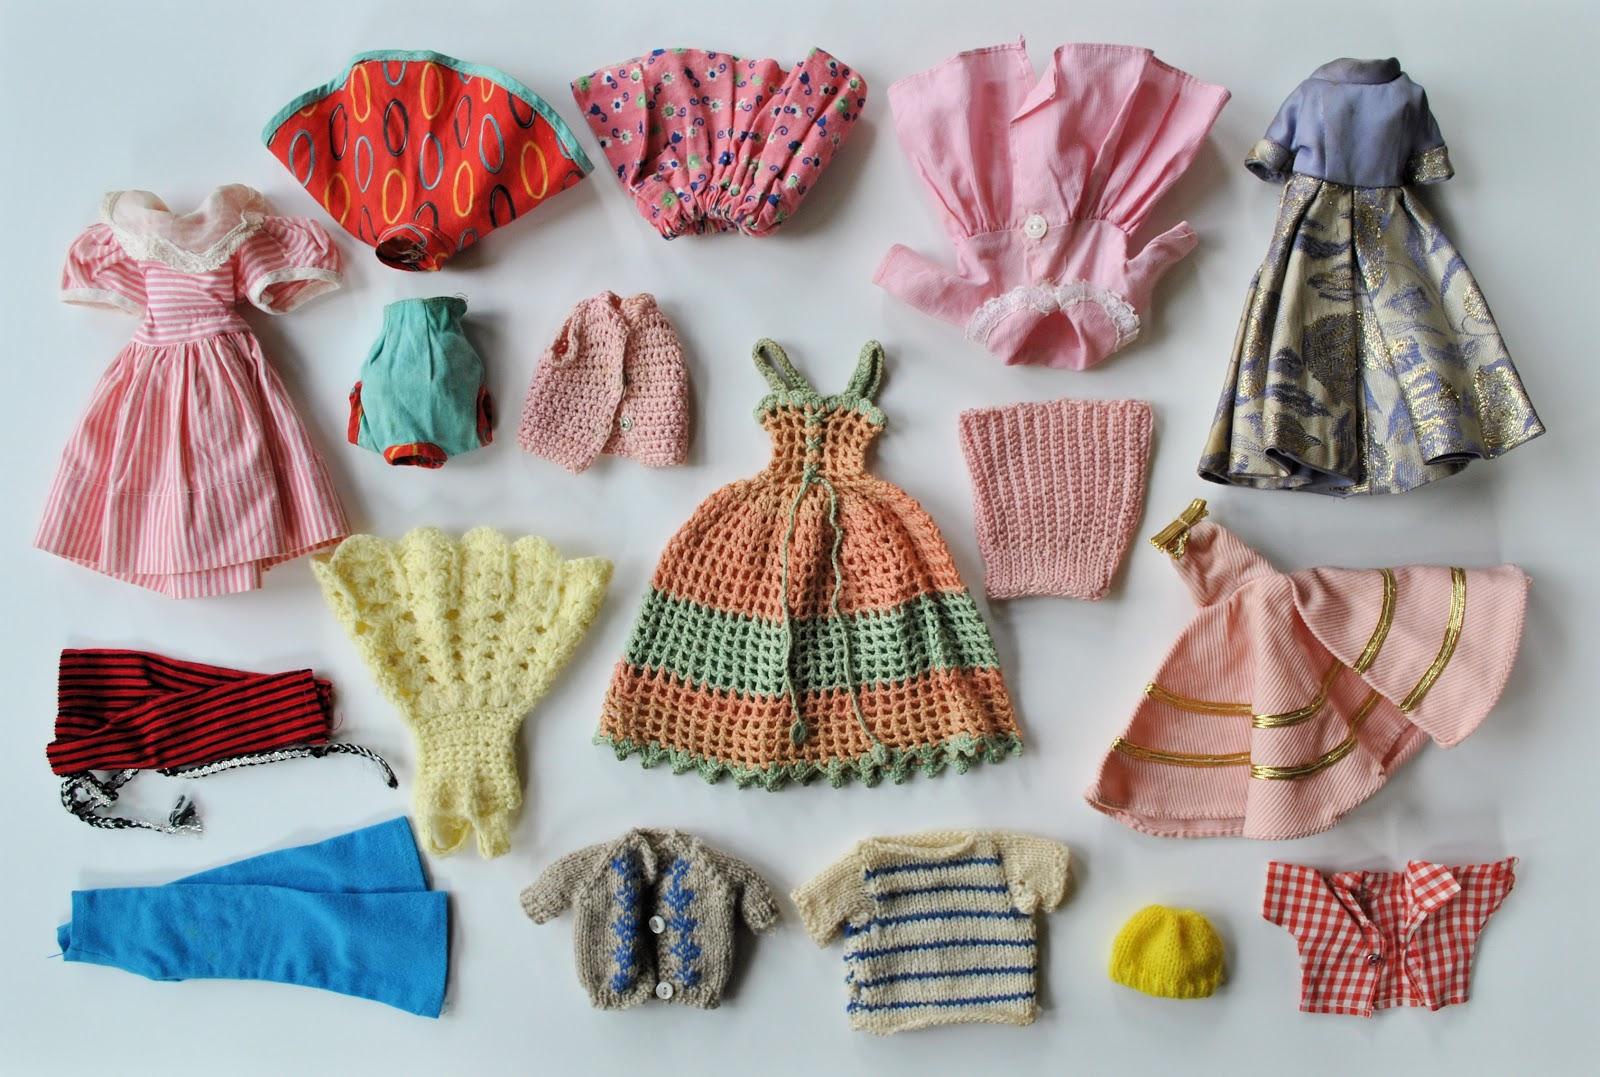 bricolagelife: homemade barbie clothes